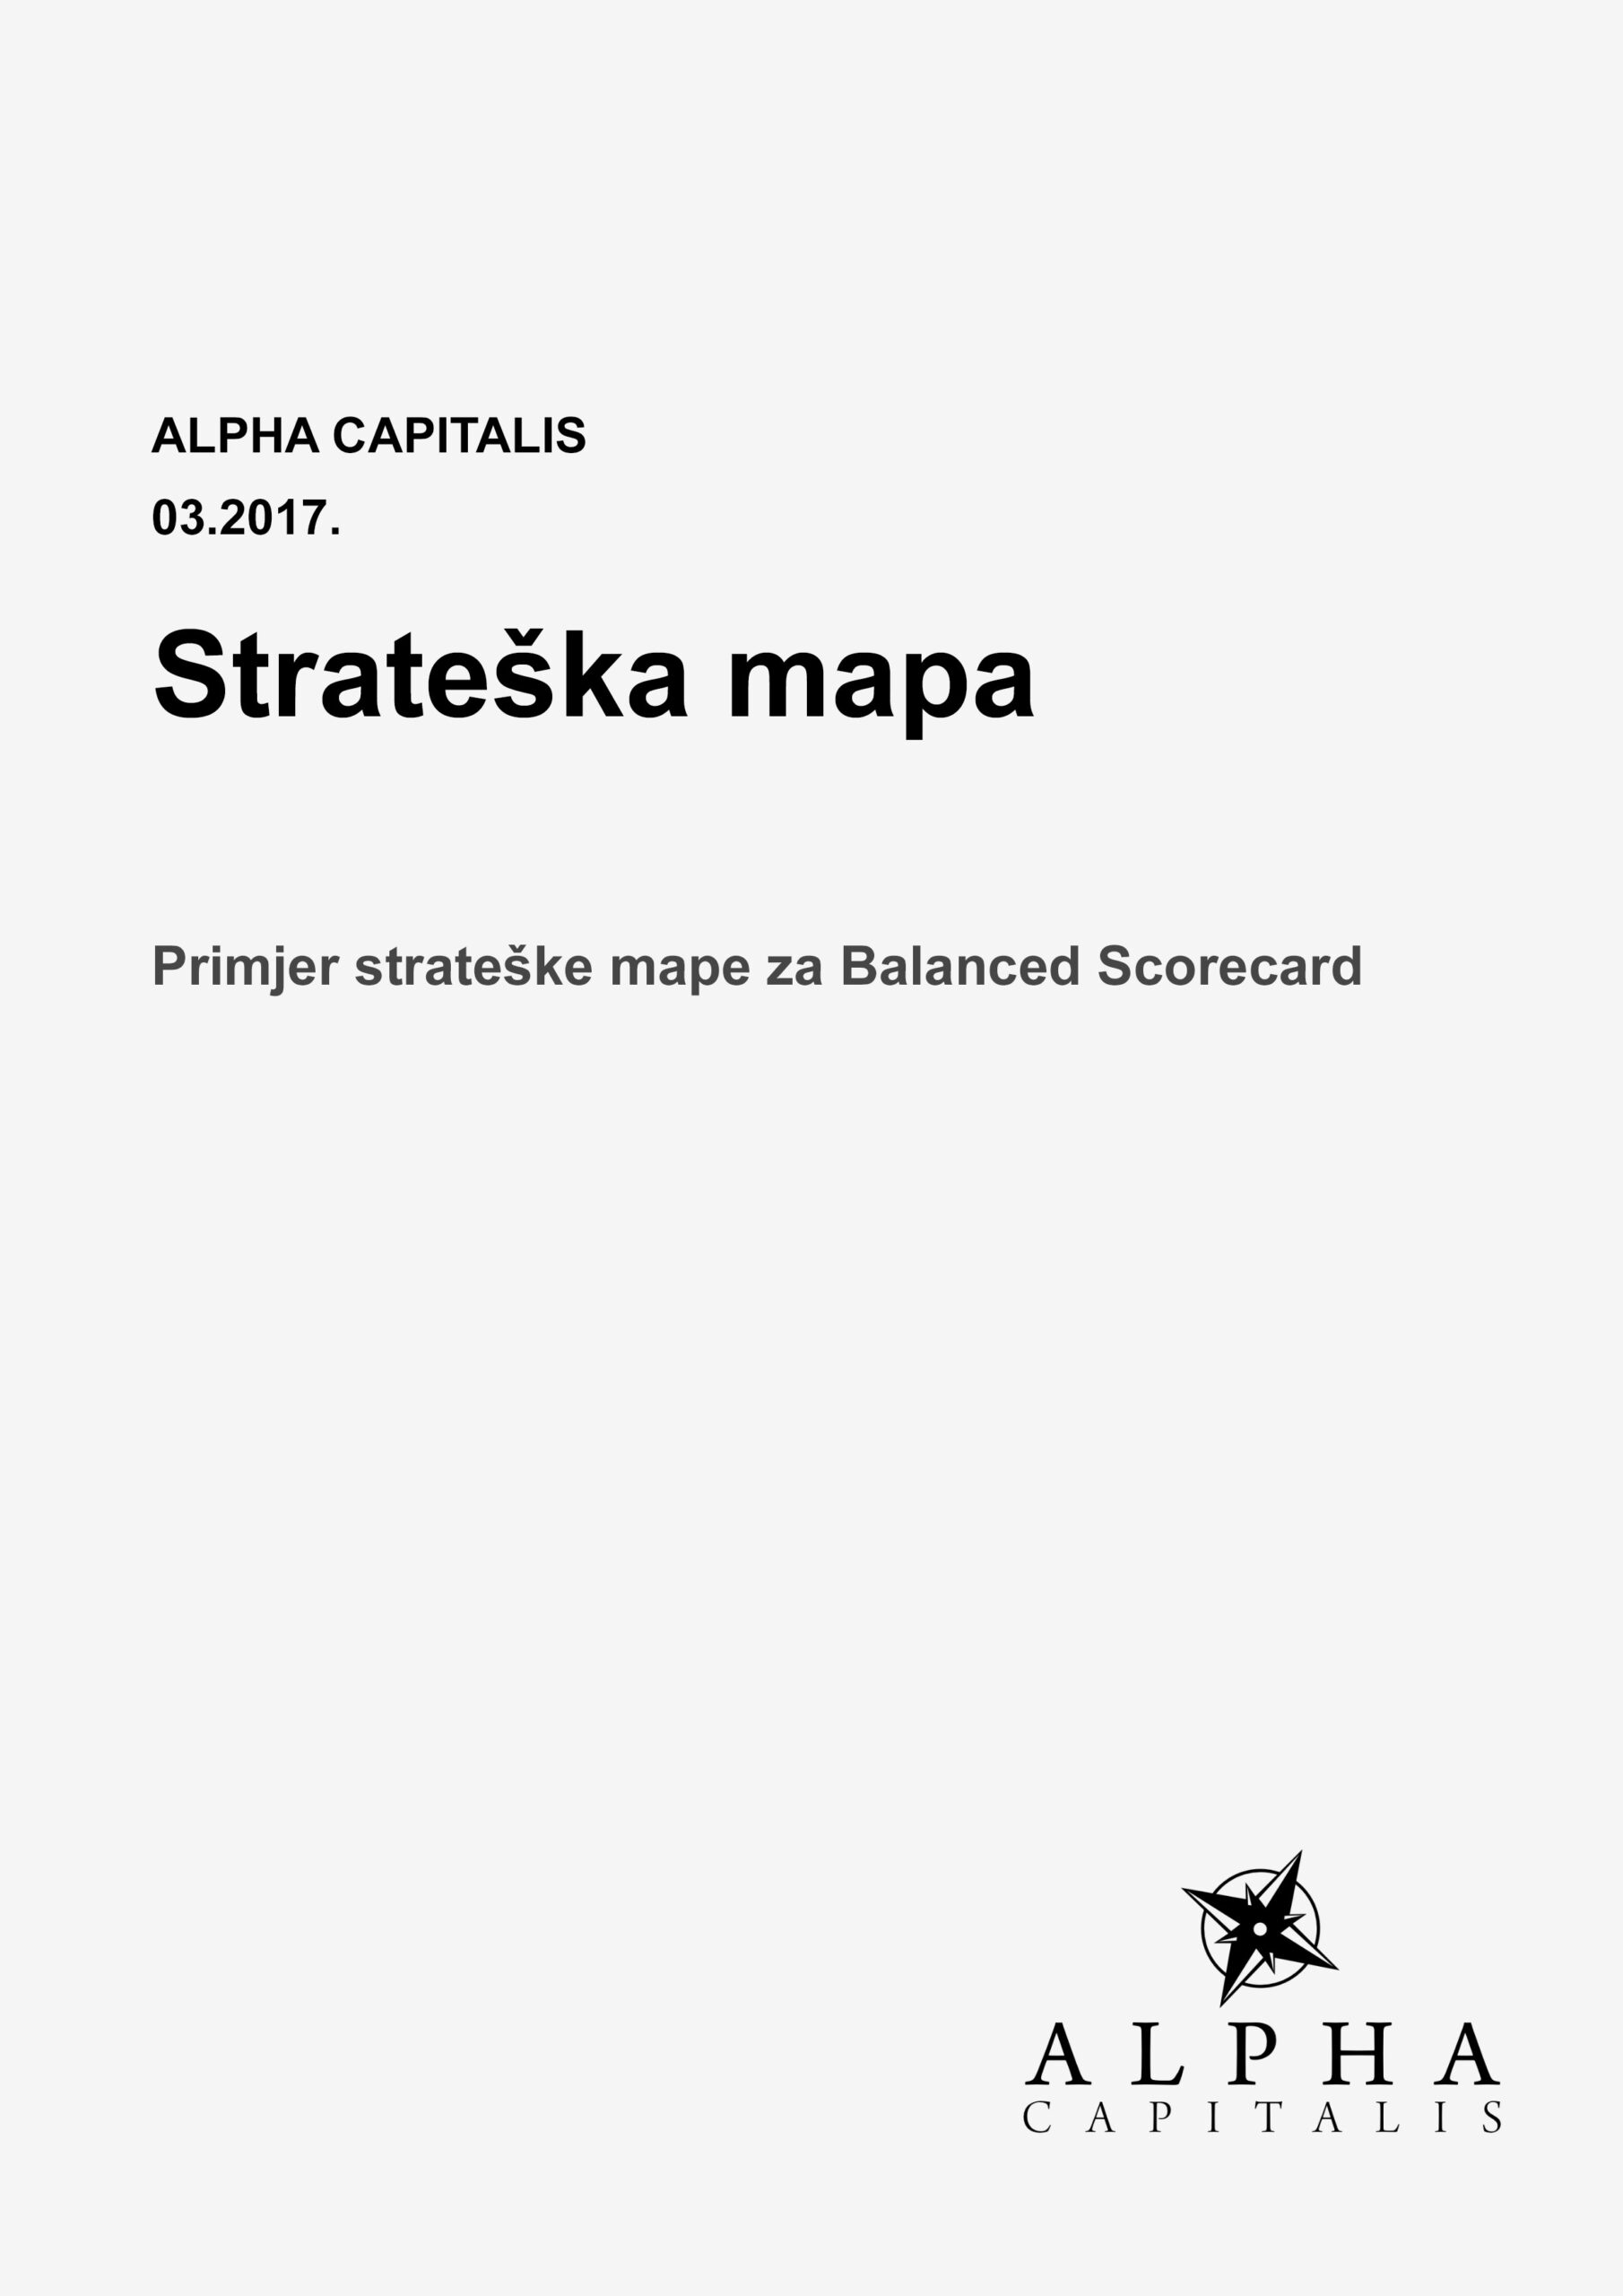 Alpha-capitalis-strateska-mapa